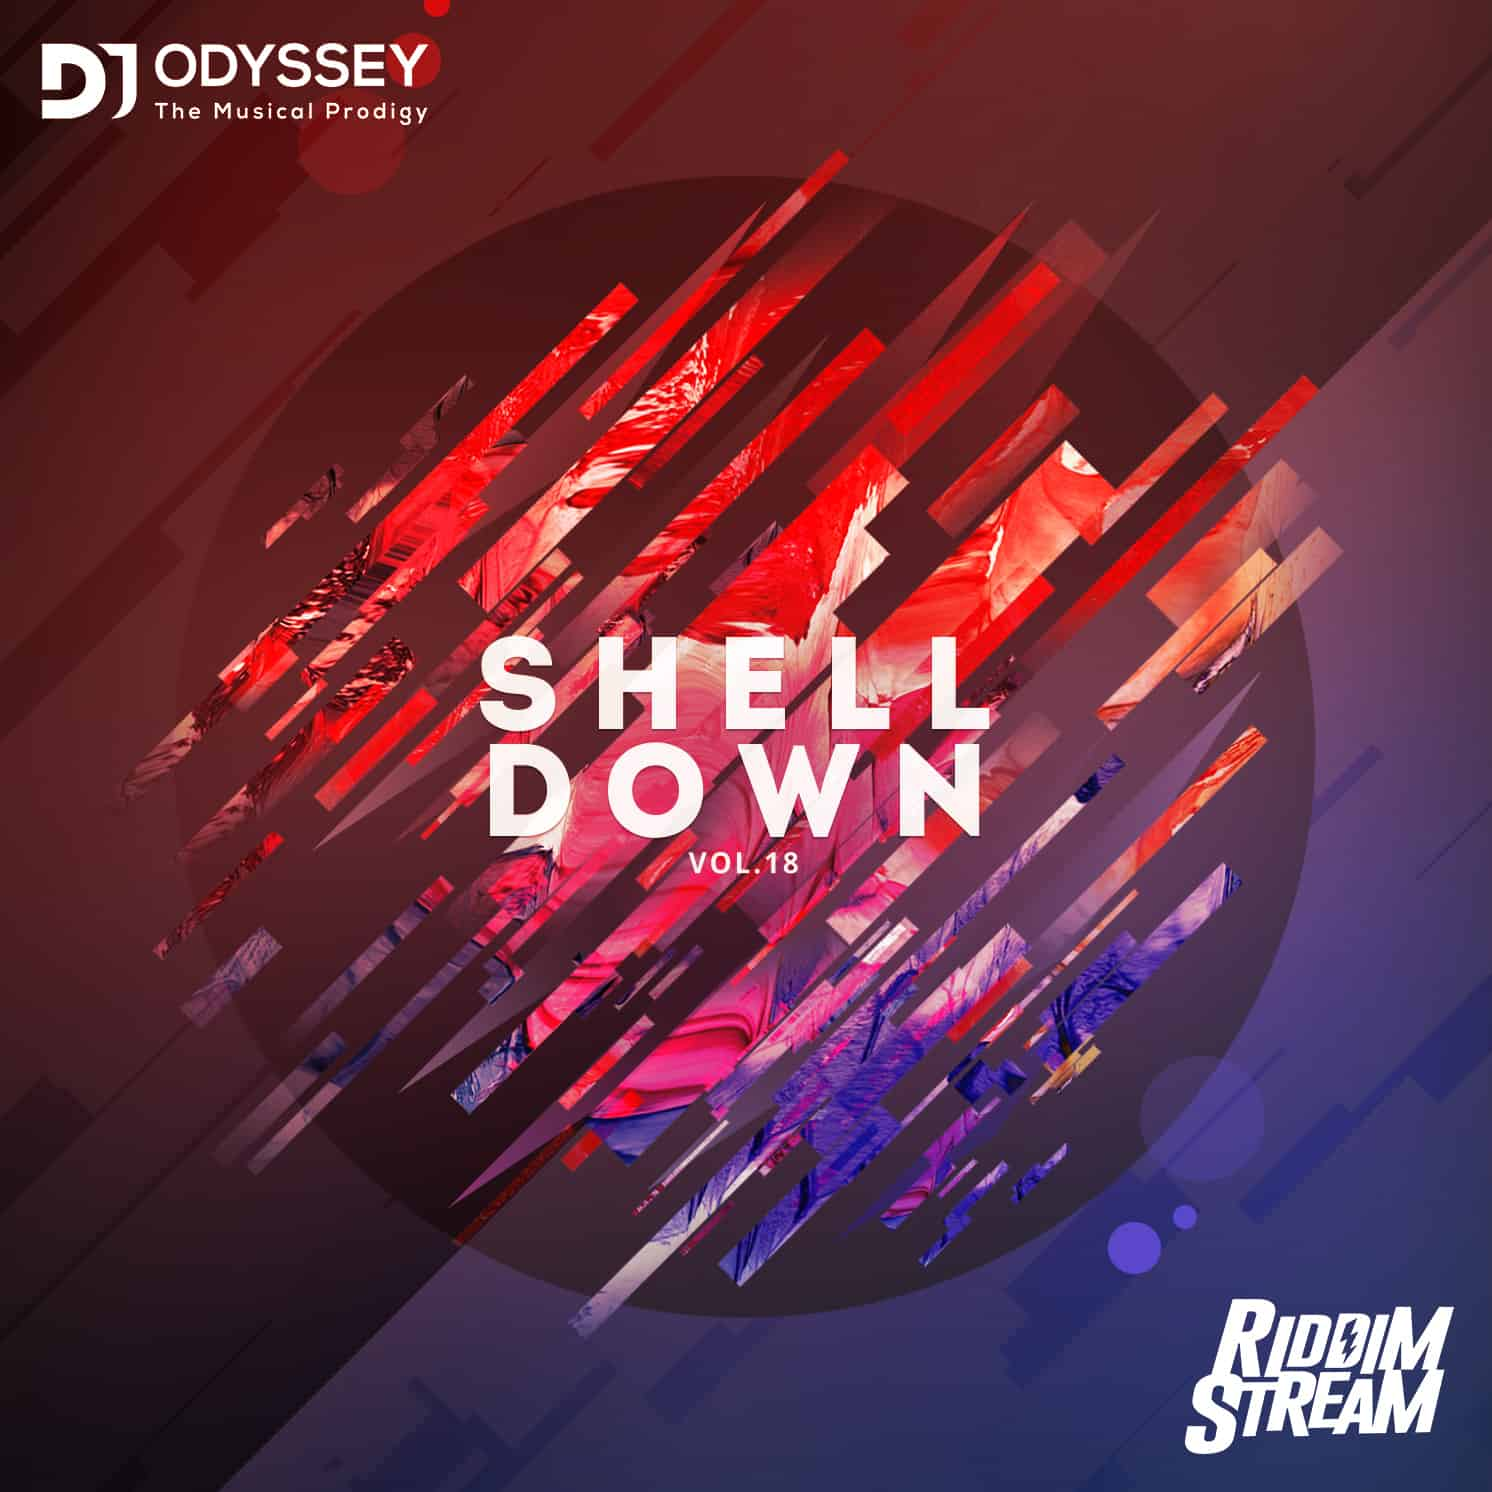 DJ Odyssey - Shell Down Vol. 18